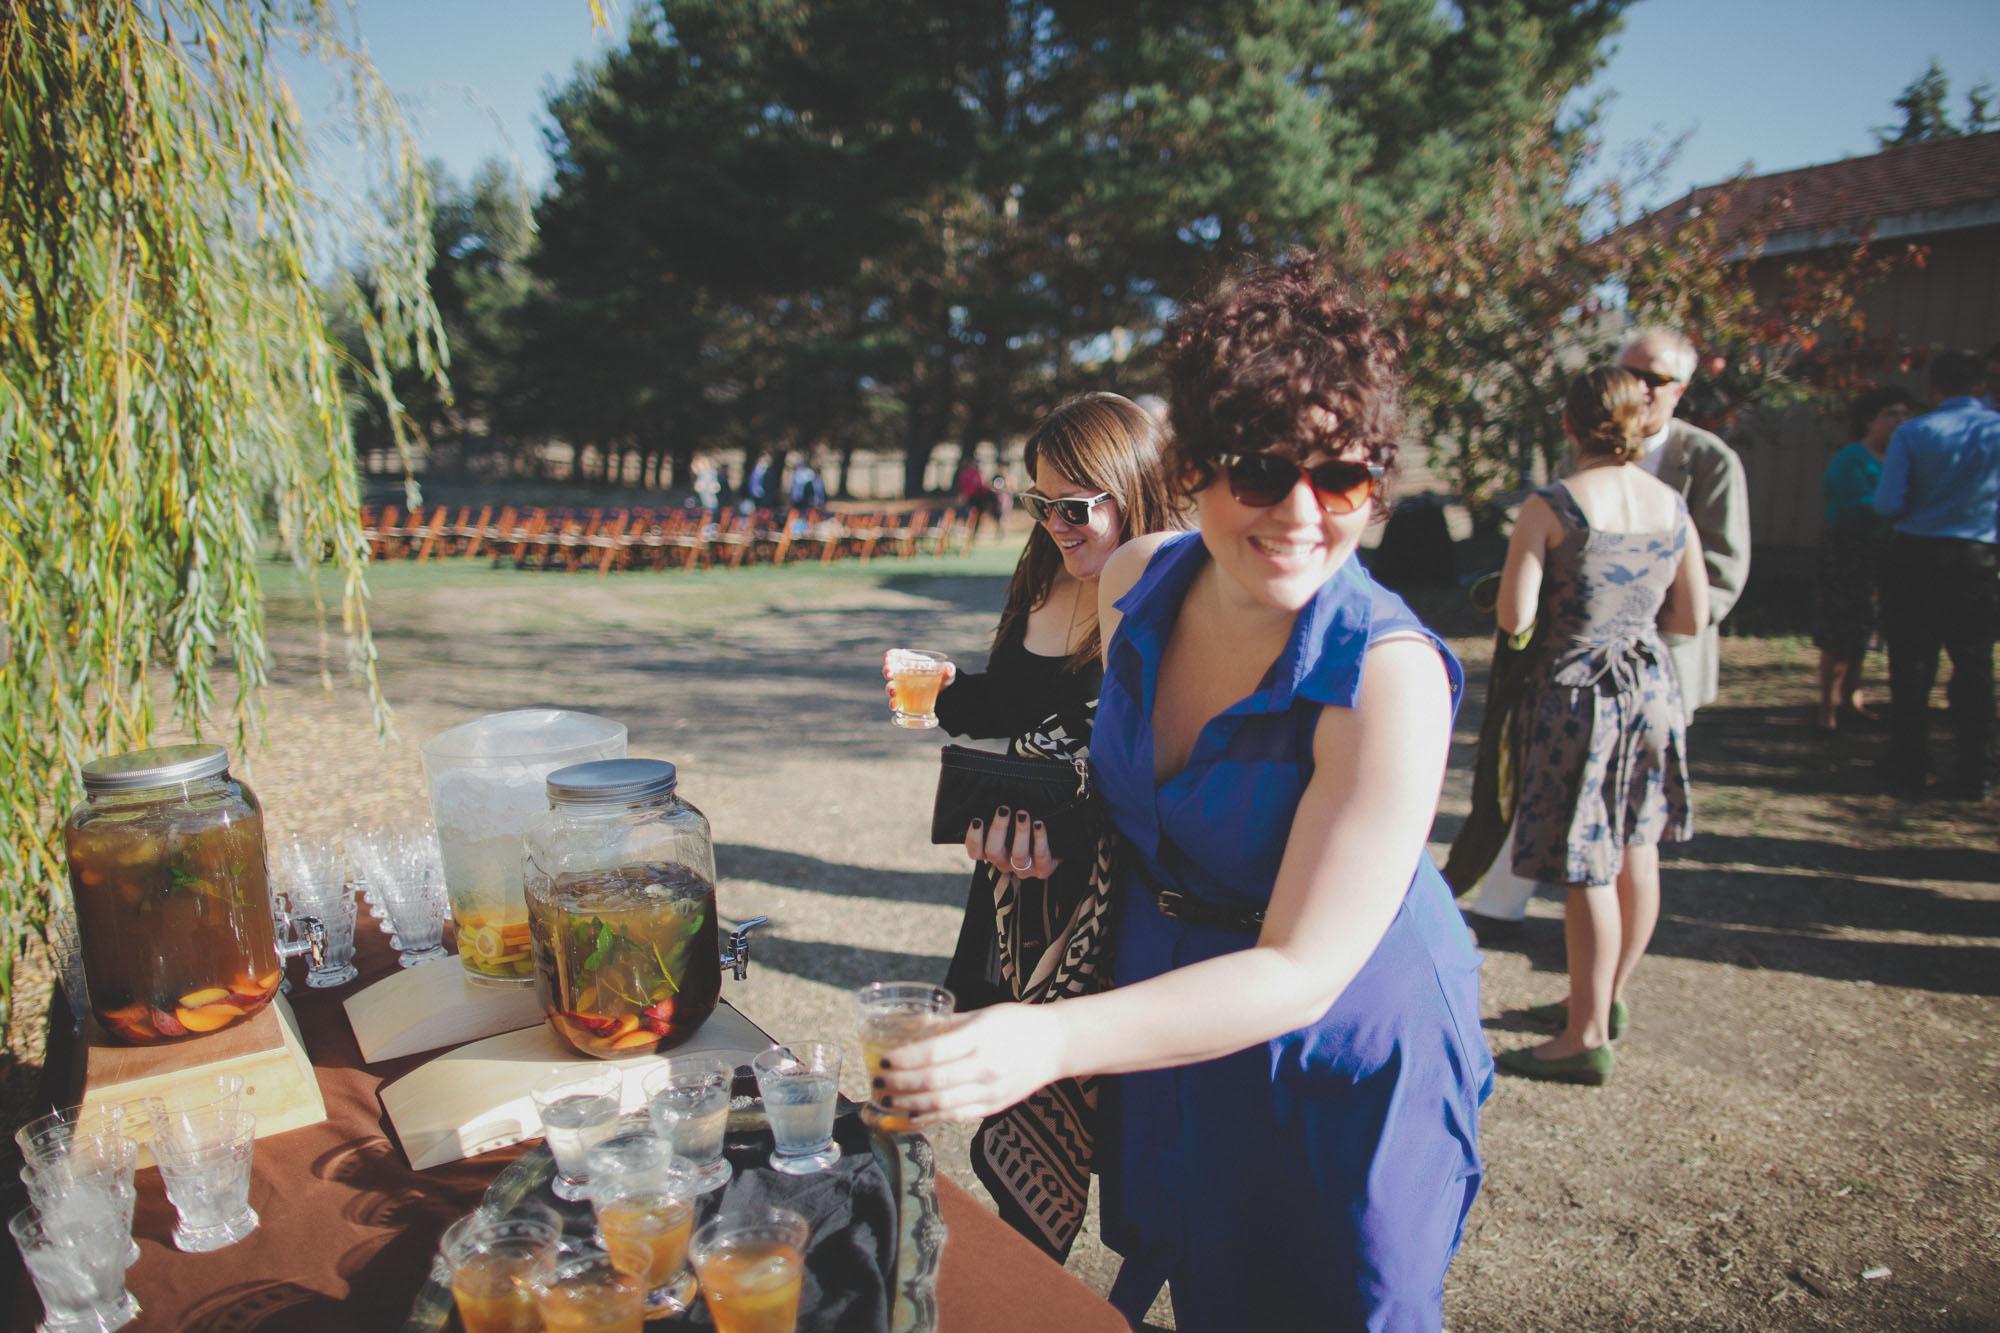 Gretchen_Gause_Petaluma_Olympias_Valley_Wedding_Photo-131.jpg